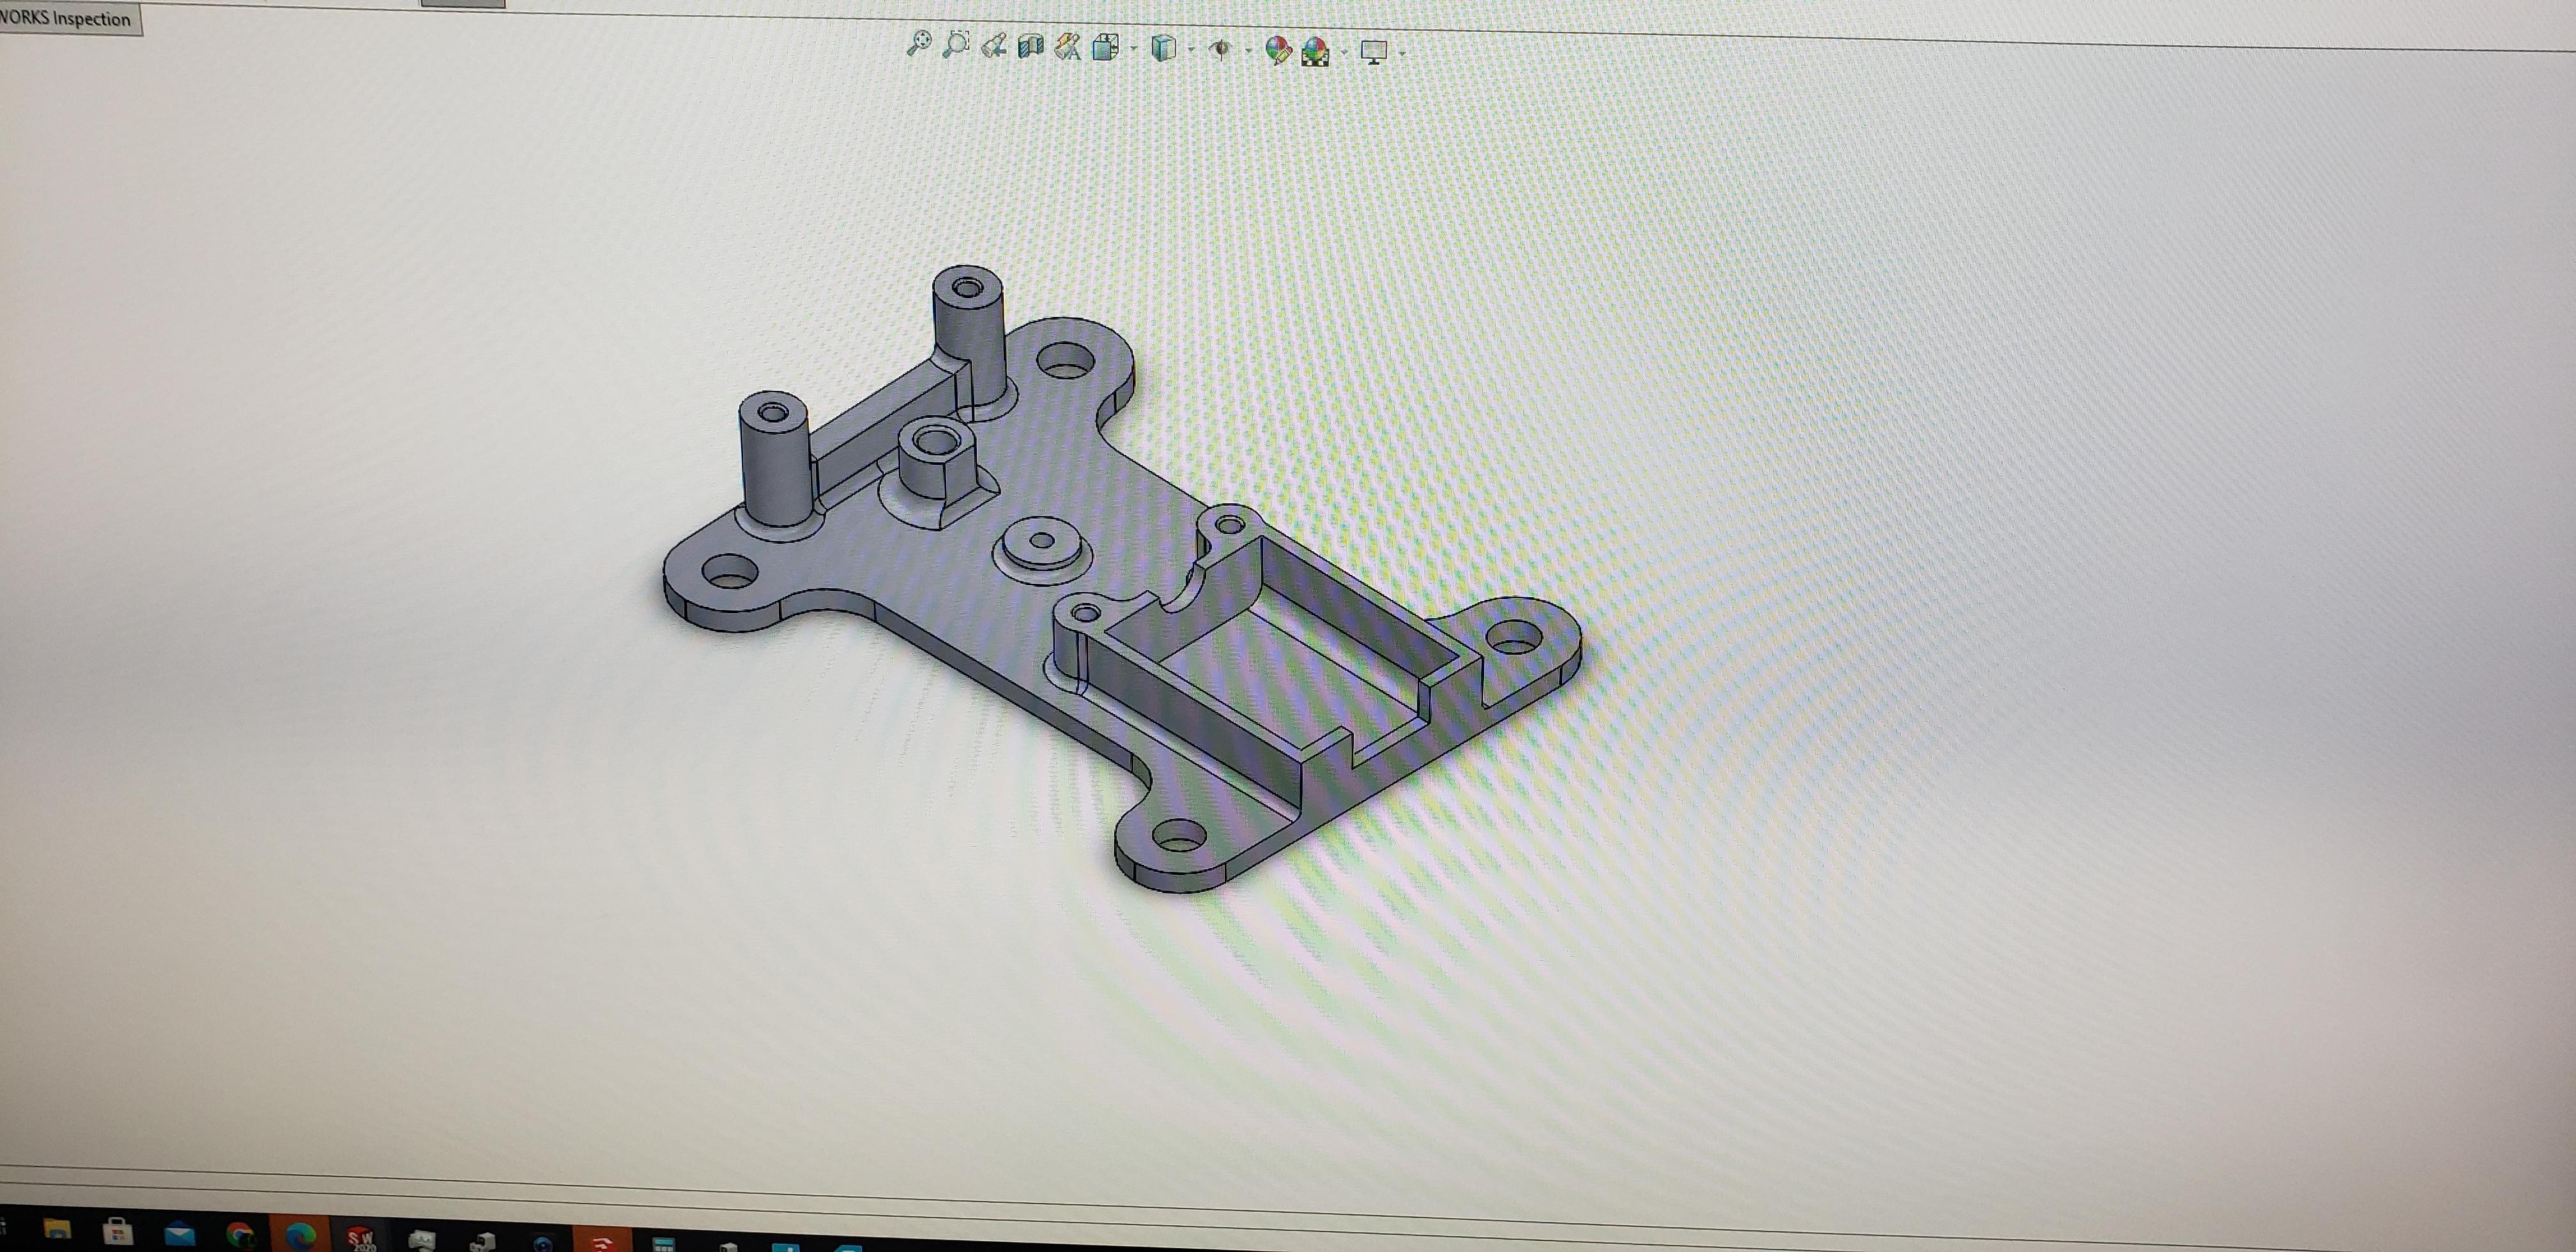 20201108_170548.jpg Download STL file Wall Gears V2  • 3D print template, SPEKERDUDE